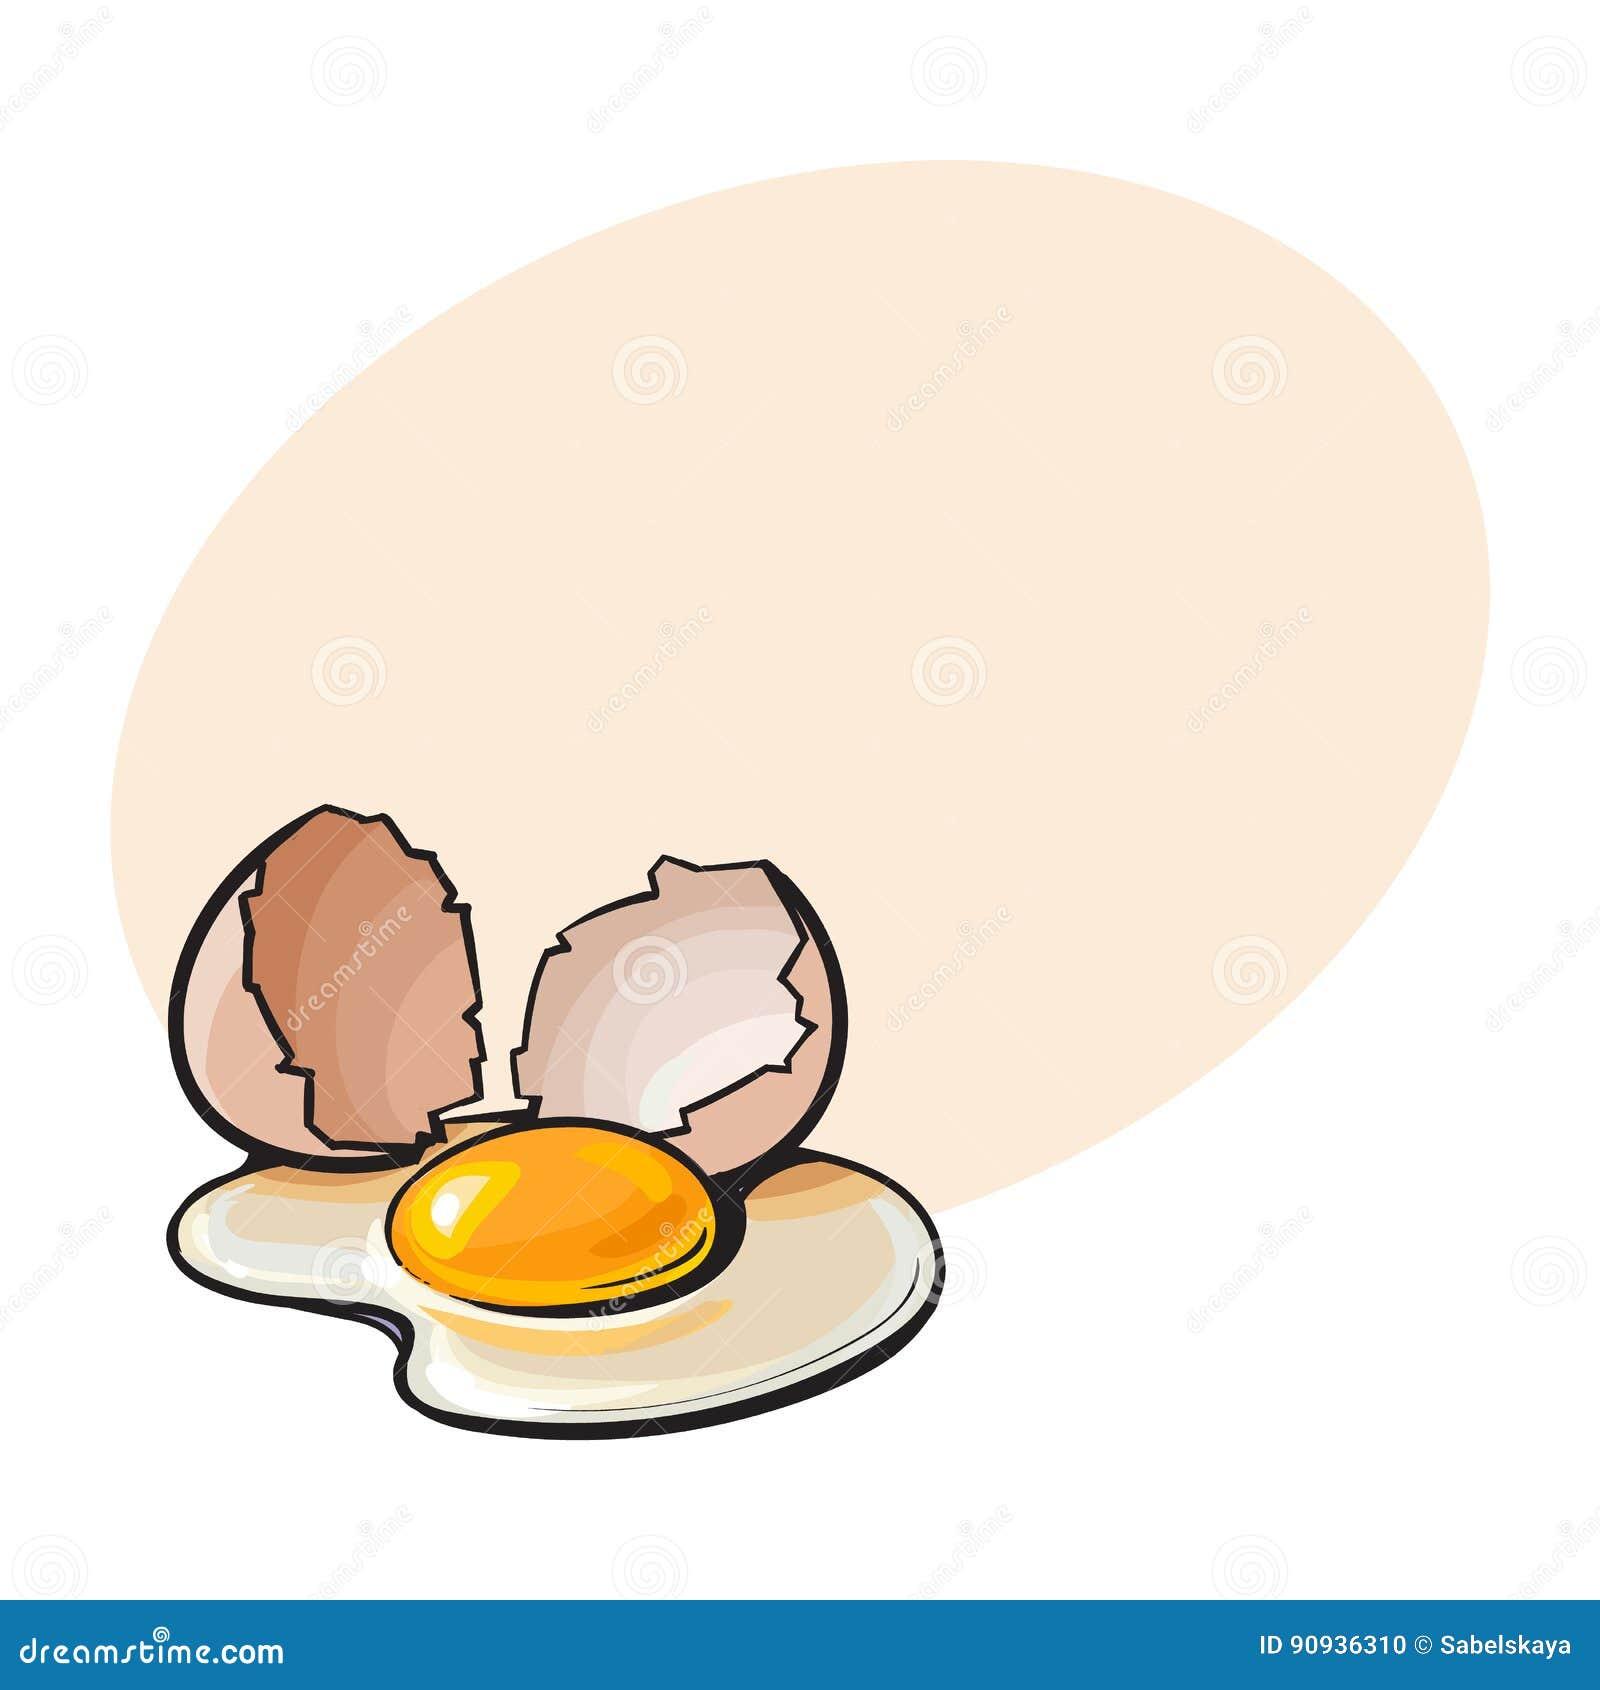 Cracked, Broken And Spilled Chicken Egg, Sketch Style Vector ...